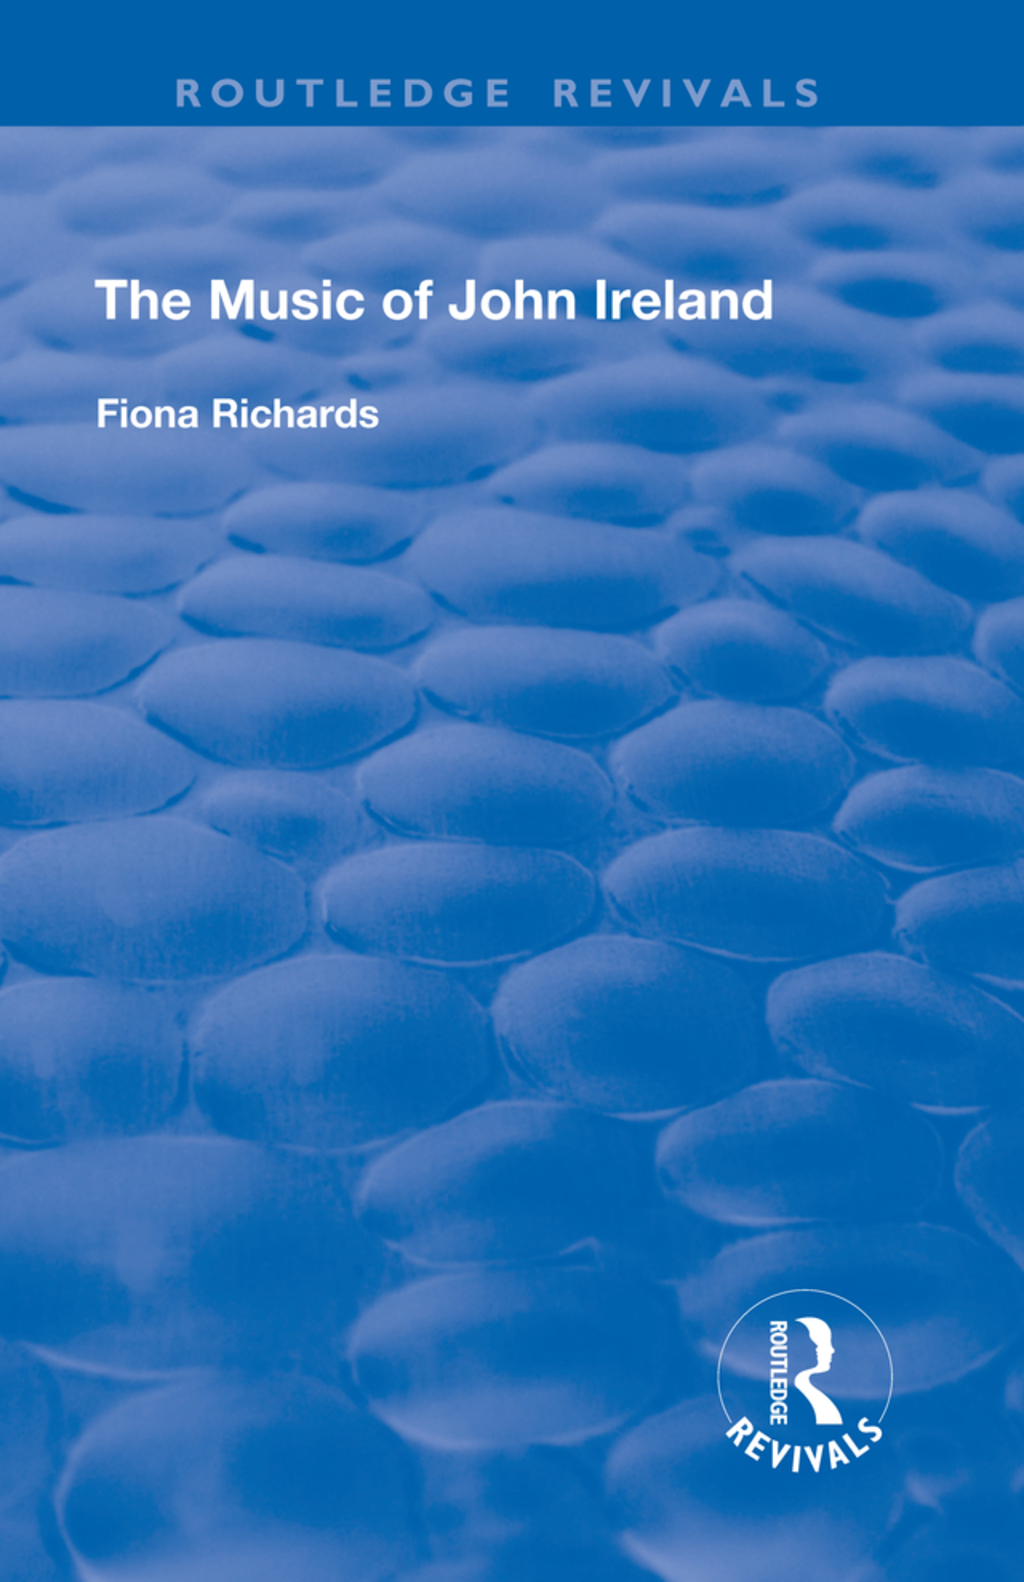 The Music of John Ireland (eBook Rental)